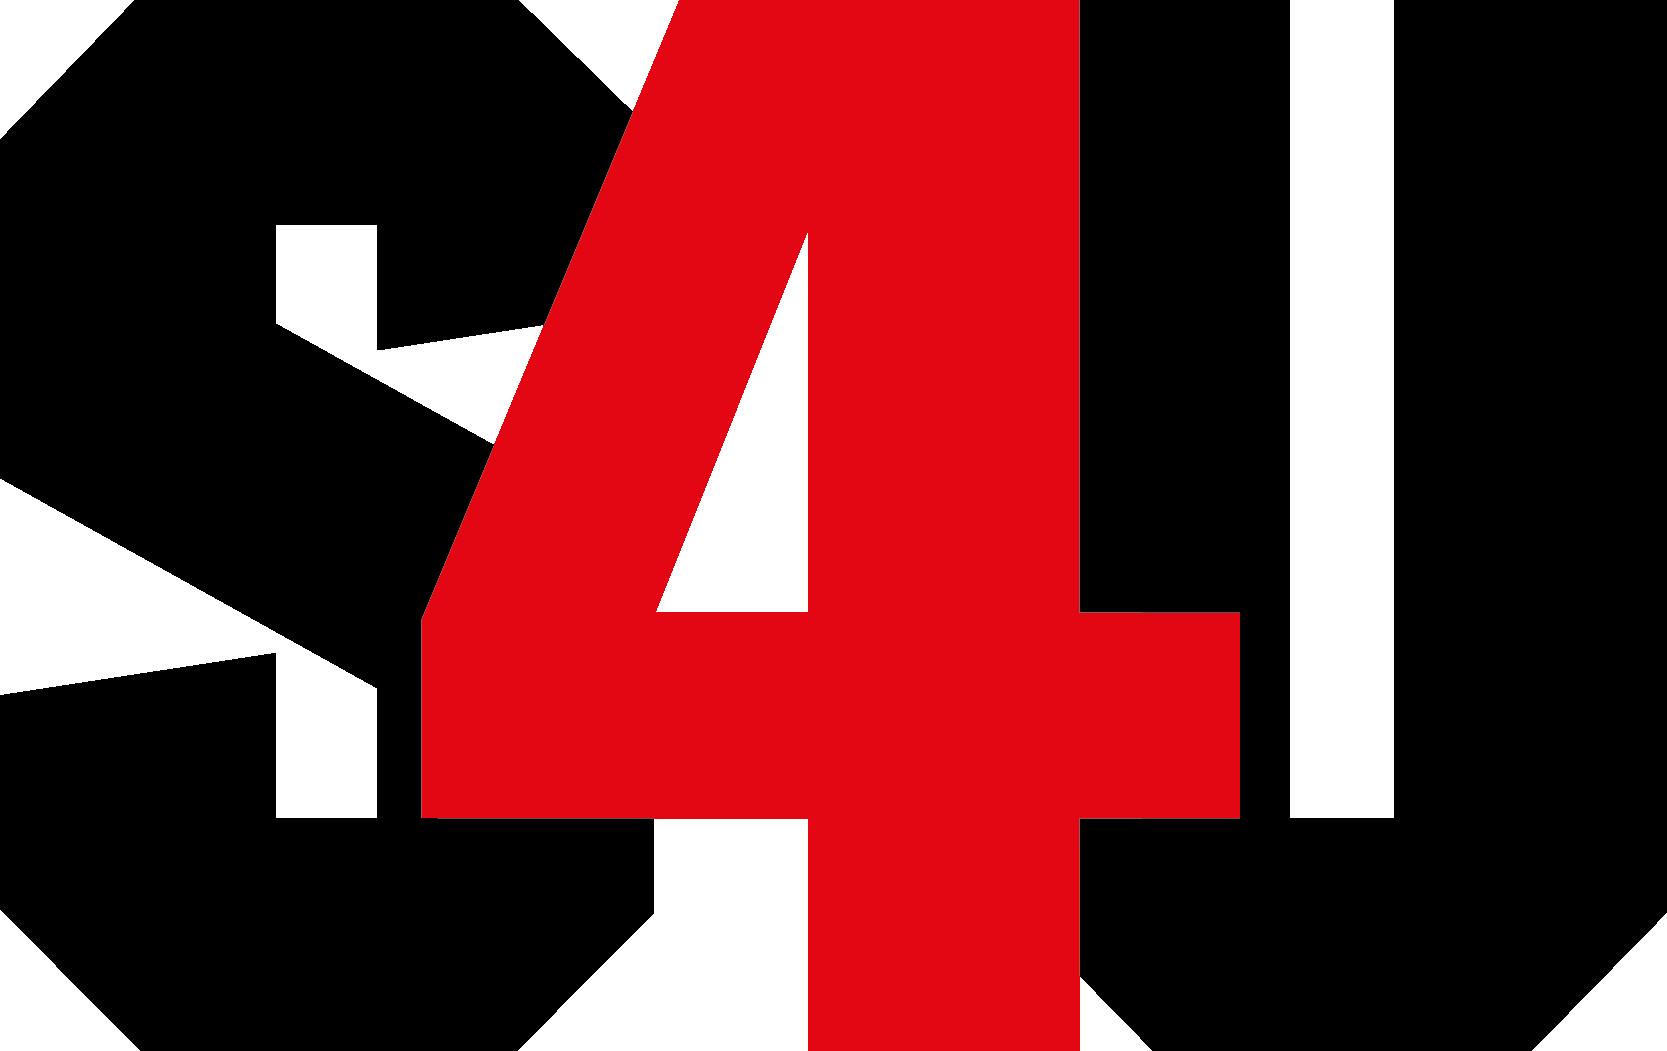 S4U GmbH